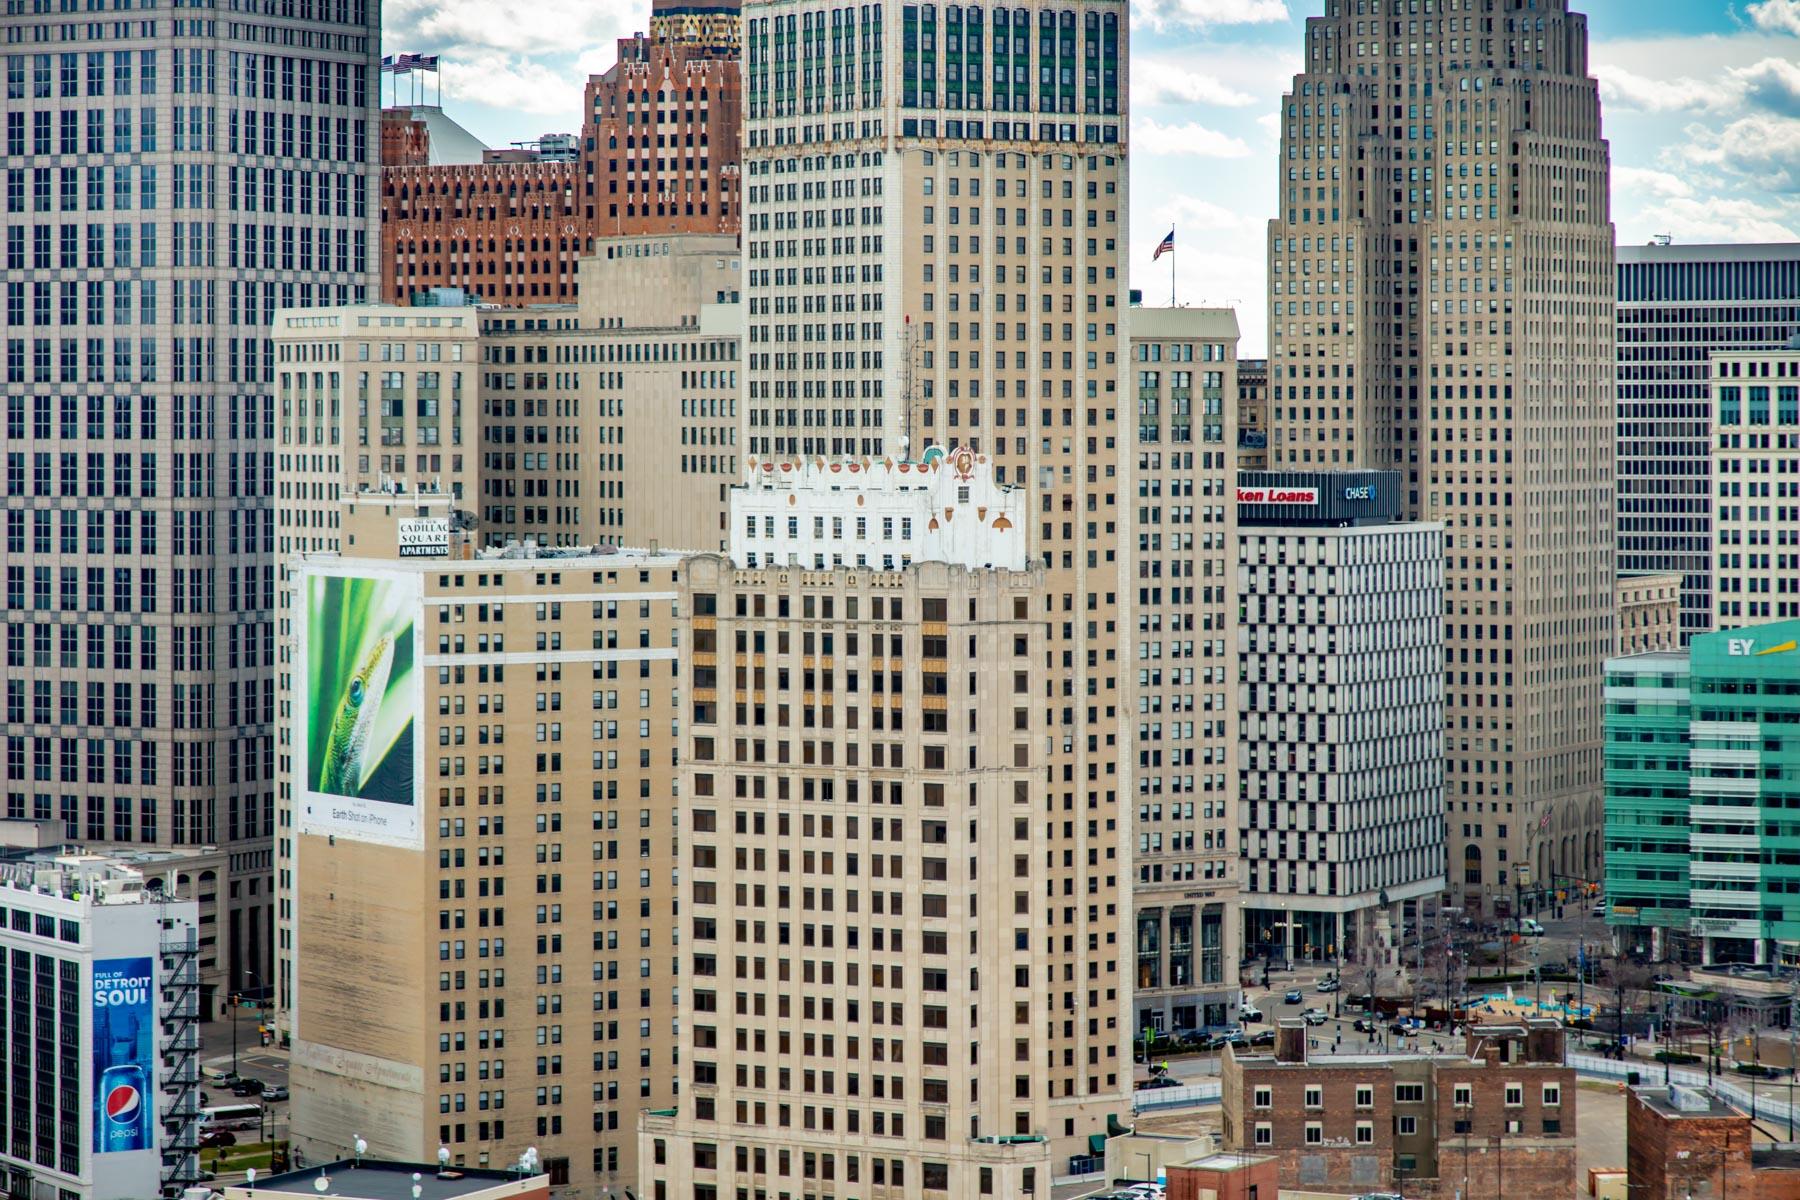 City pics GtCH Rooftop - 1z3a7264